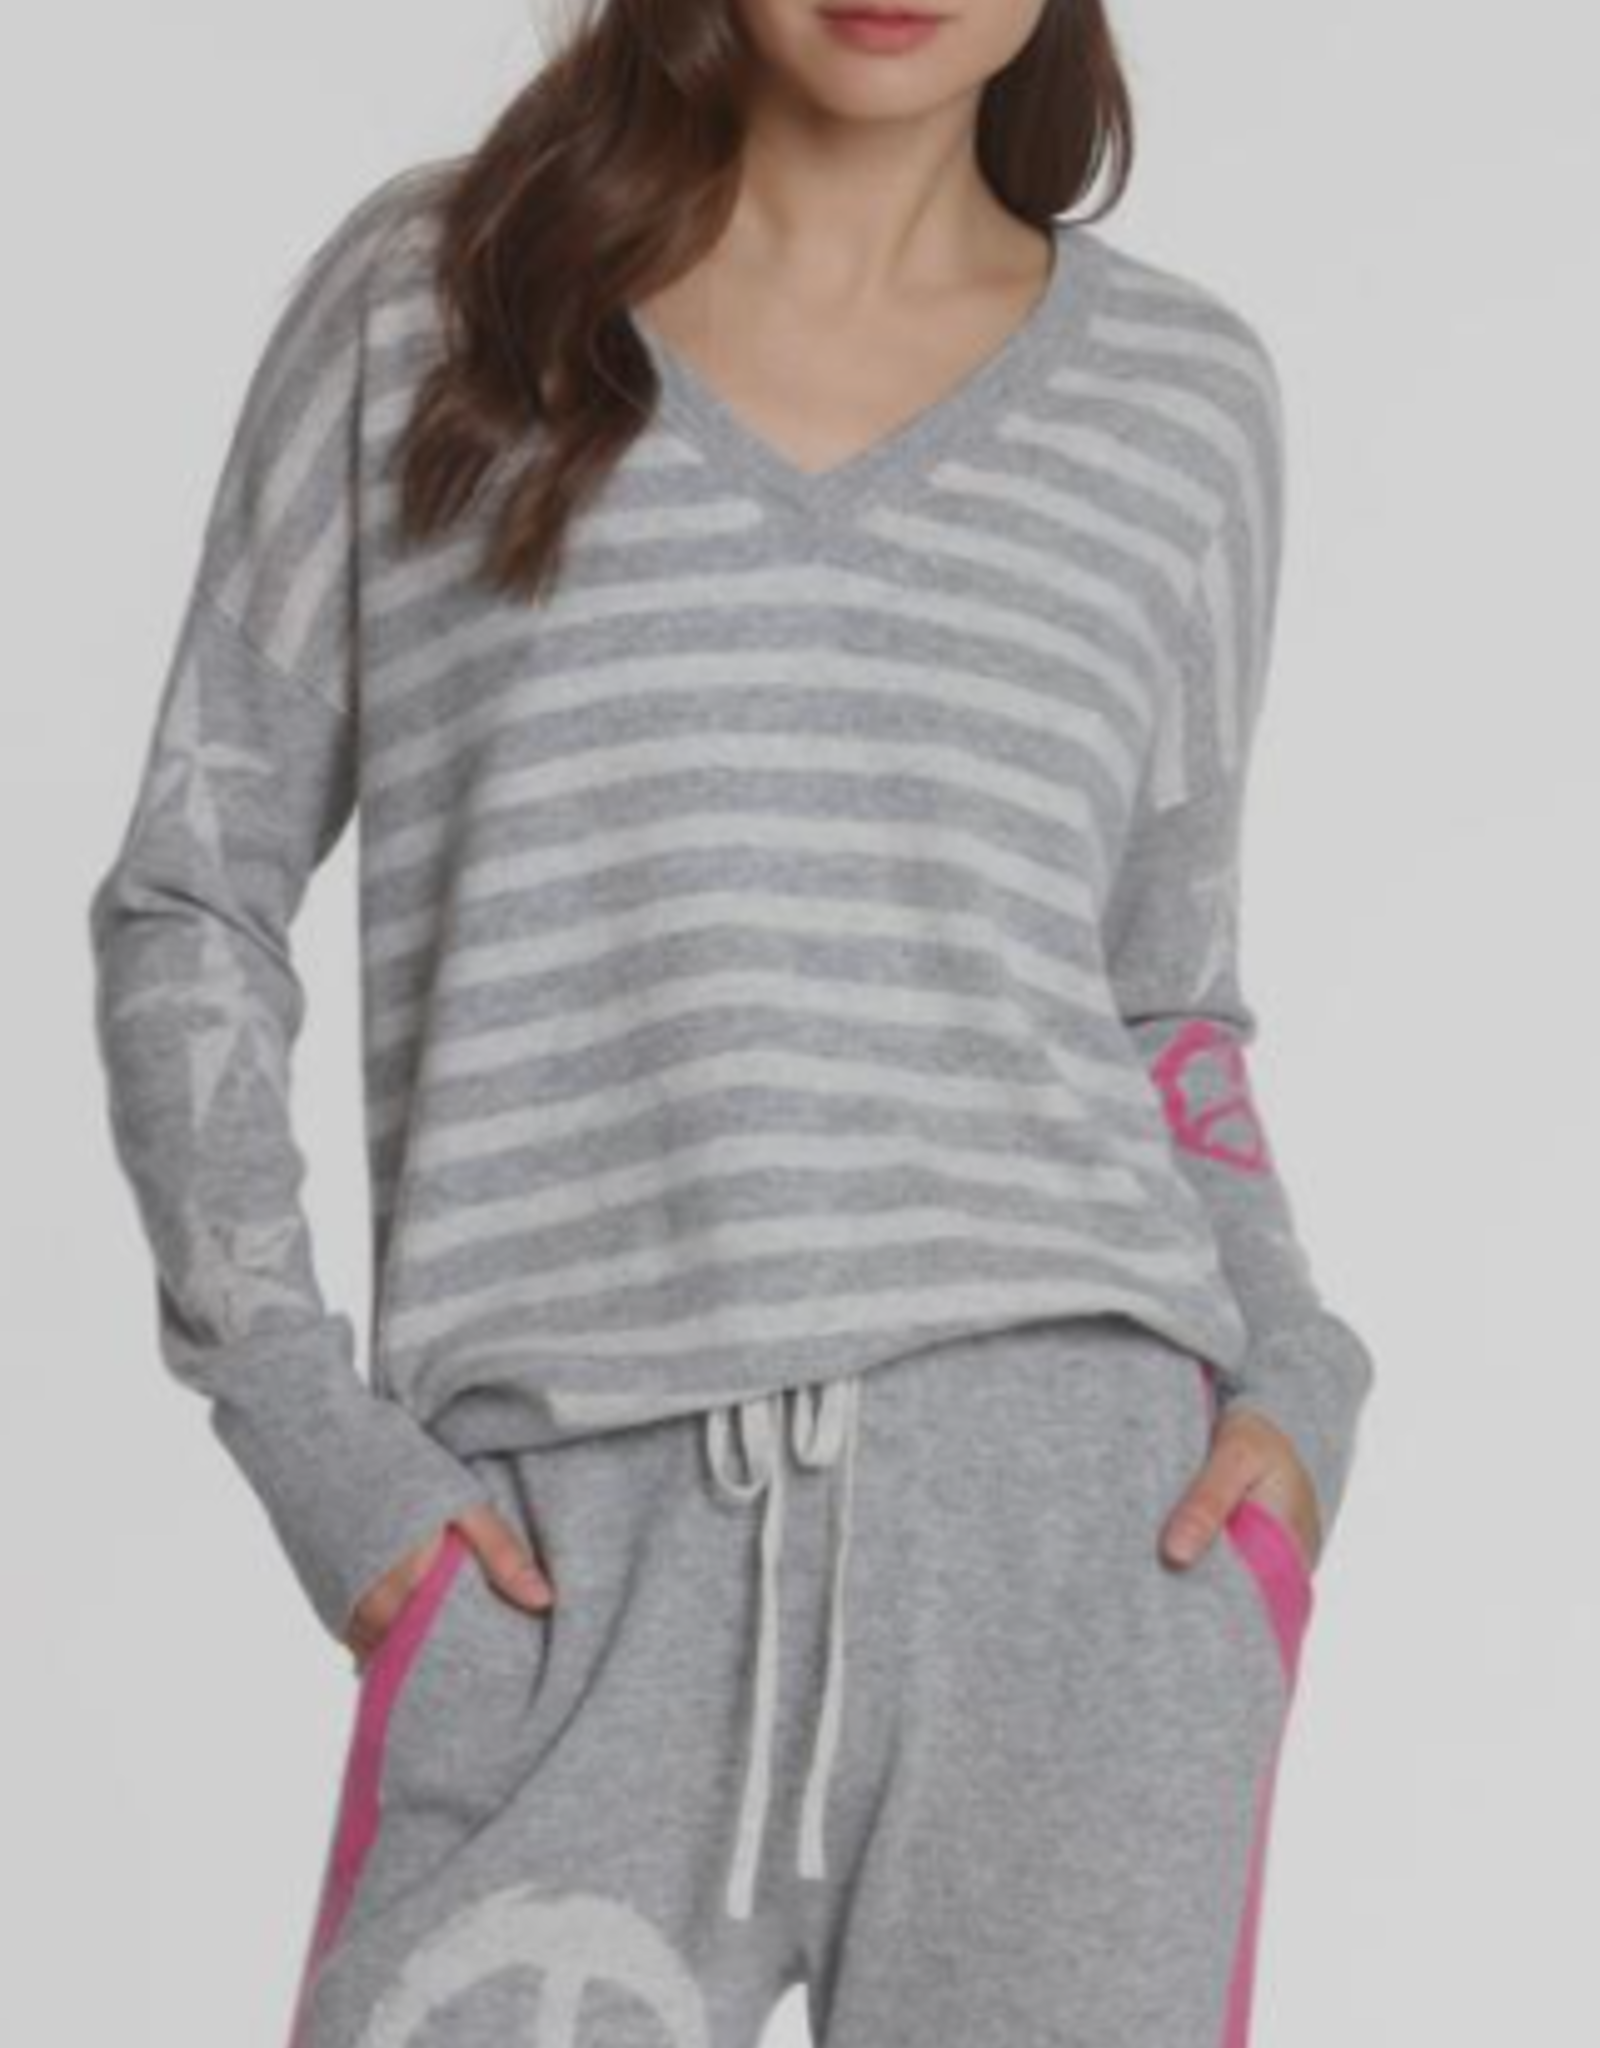 LABEL+thread Prep Star Vee Sweater